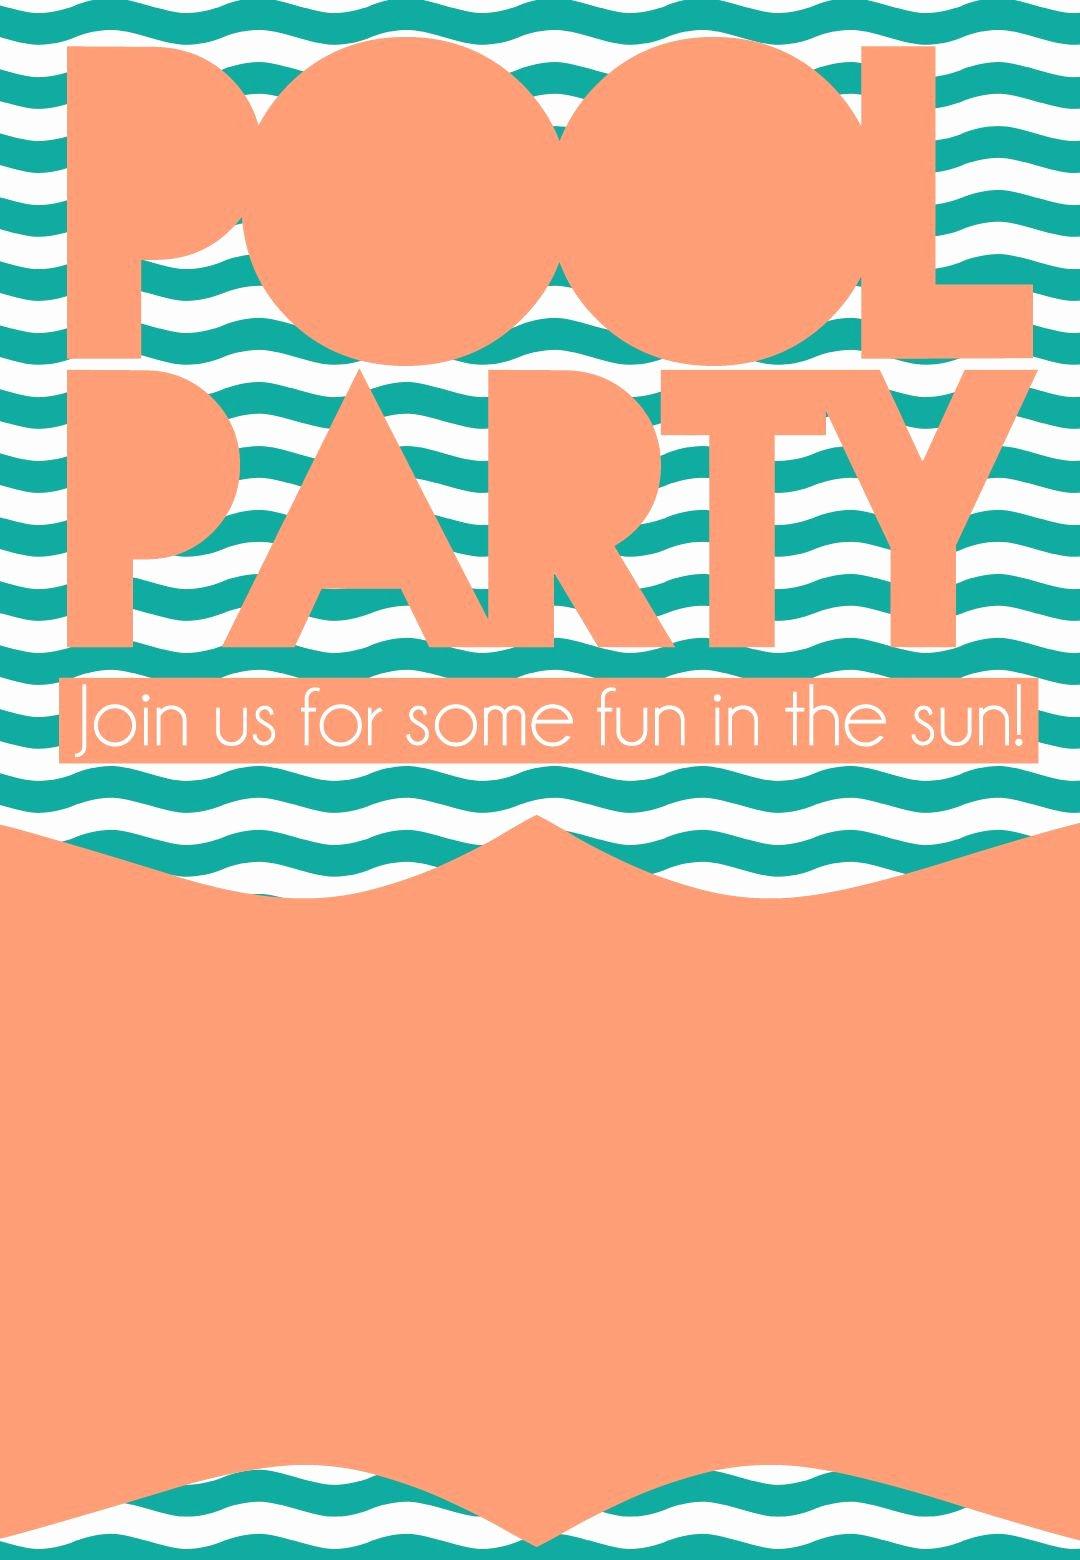 Summer Pool Party Invitation Free Printable Diy